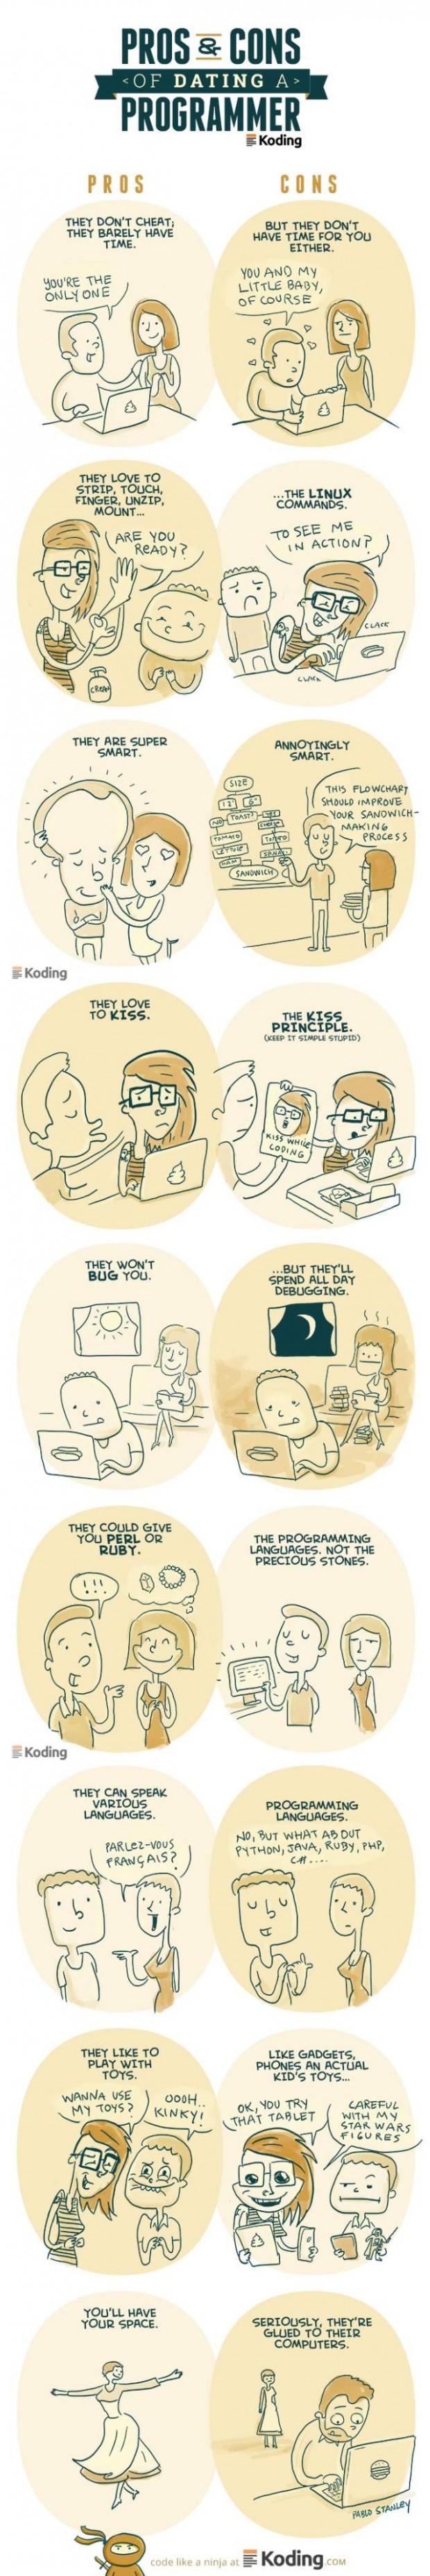 ProsAndCons-dating